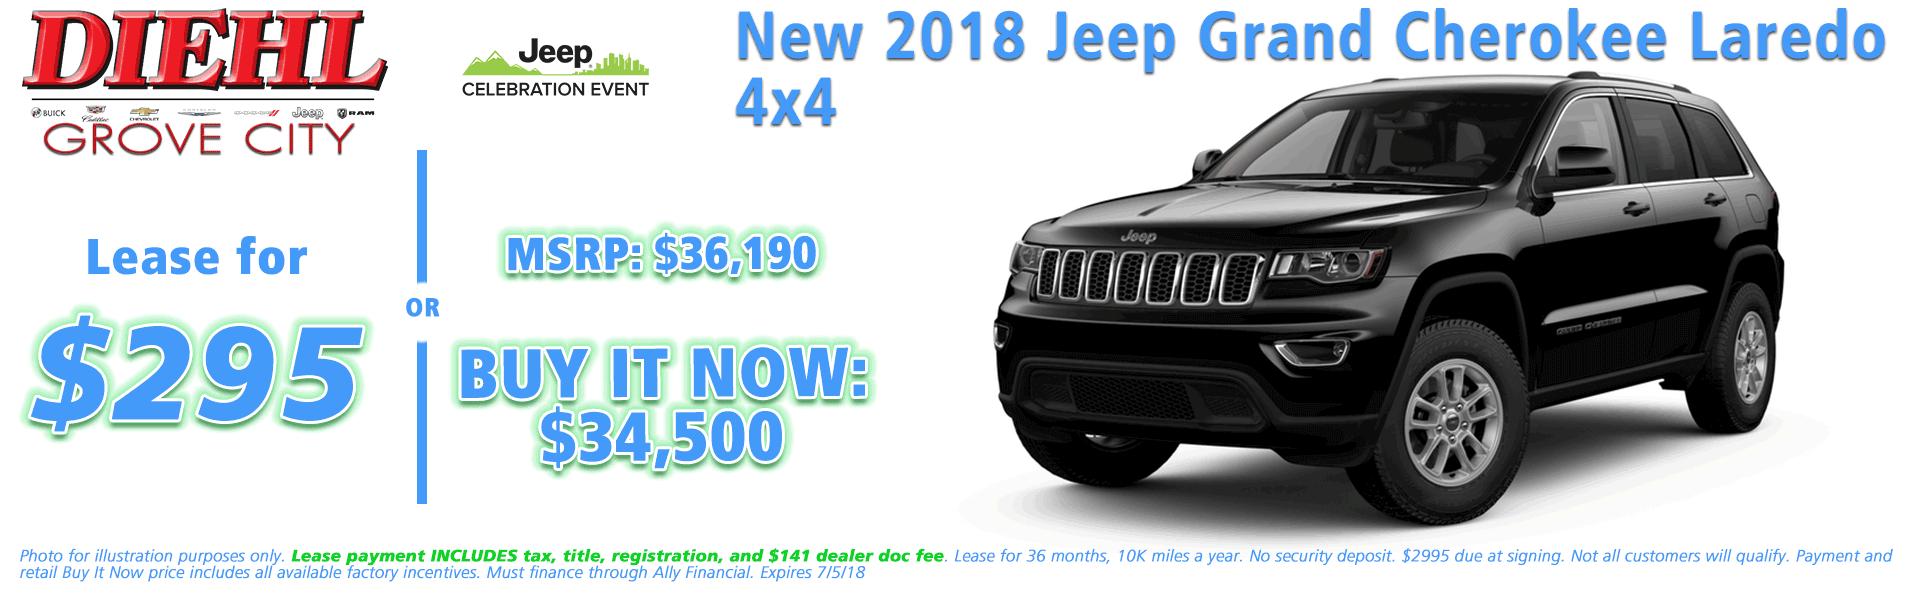 NEW 2018 JEEP GRAND CHEROKEE LAREDO E 4X4 Diehl of Grove City, Pennsylvania. Chrysler Jeep Dodge Ram Chevrolet Buick Cadillac dealership